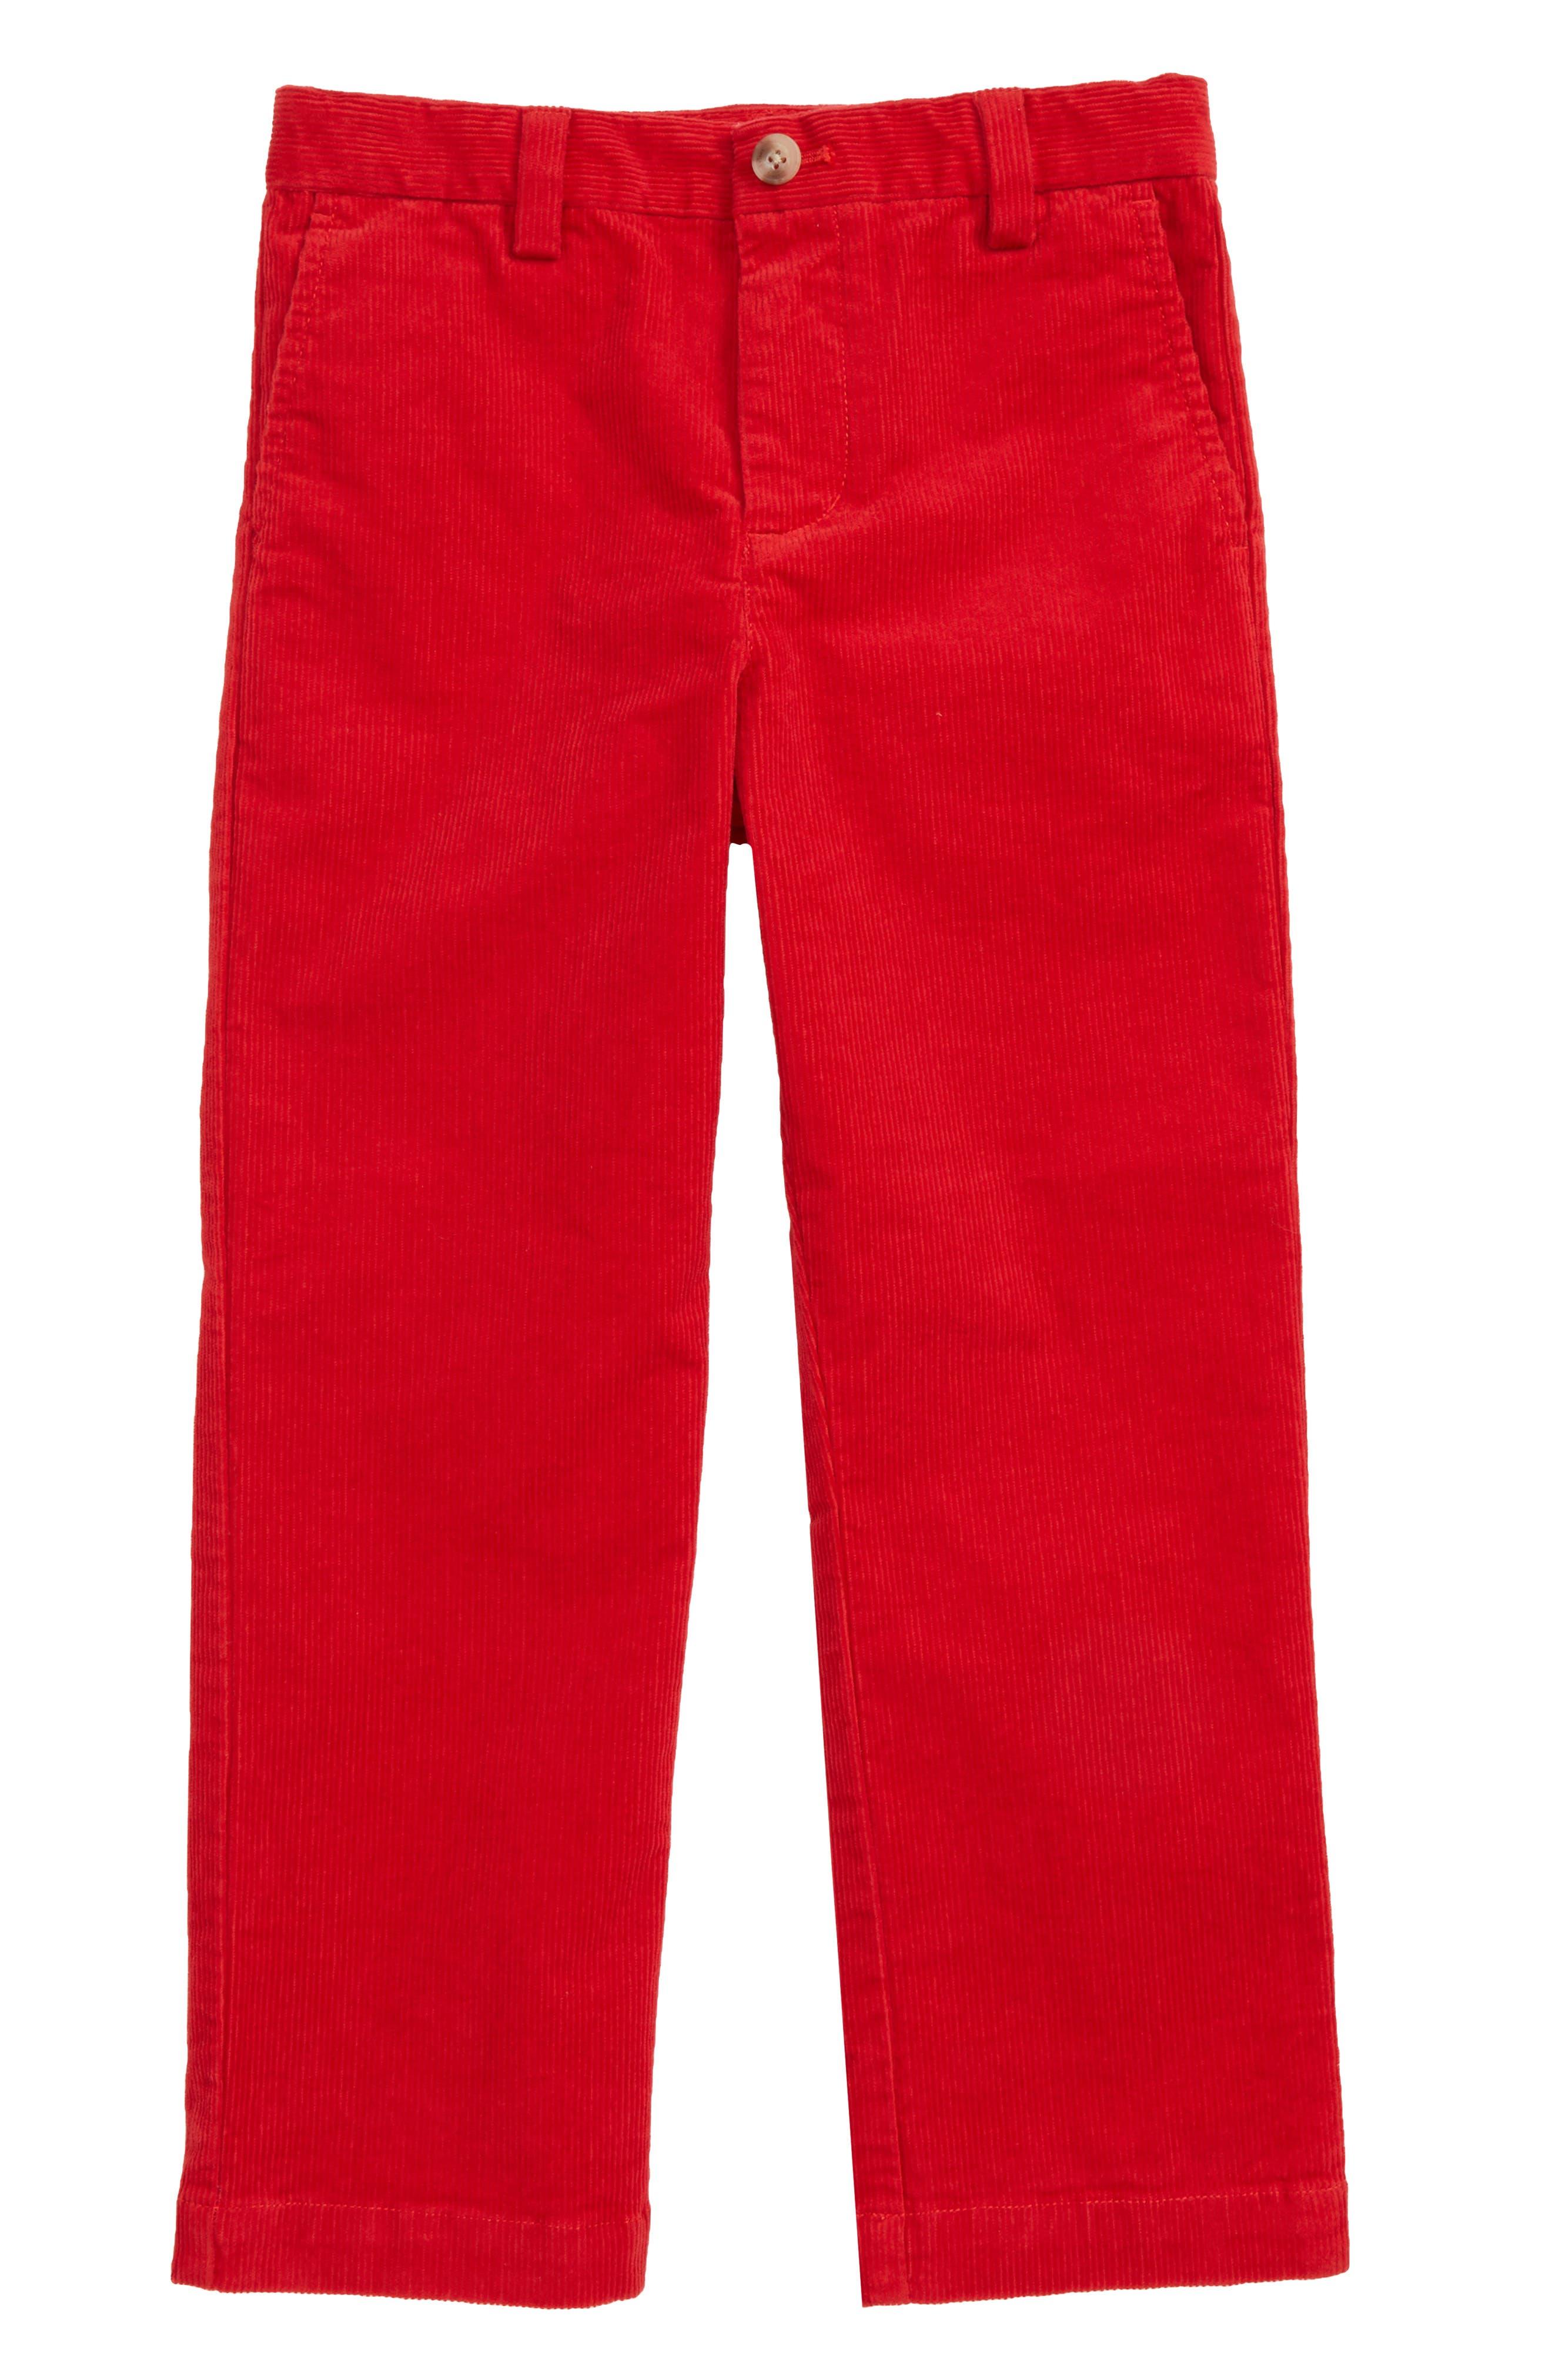 Toddler Boys Vineyard Vines Corduroy Breaker Pants Size 3T  Red